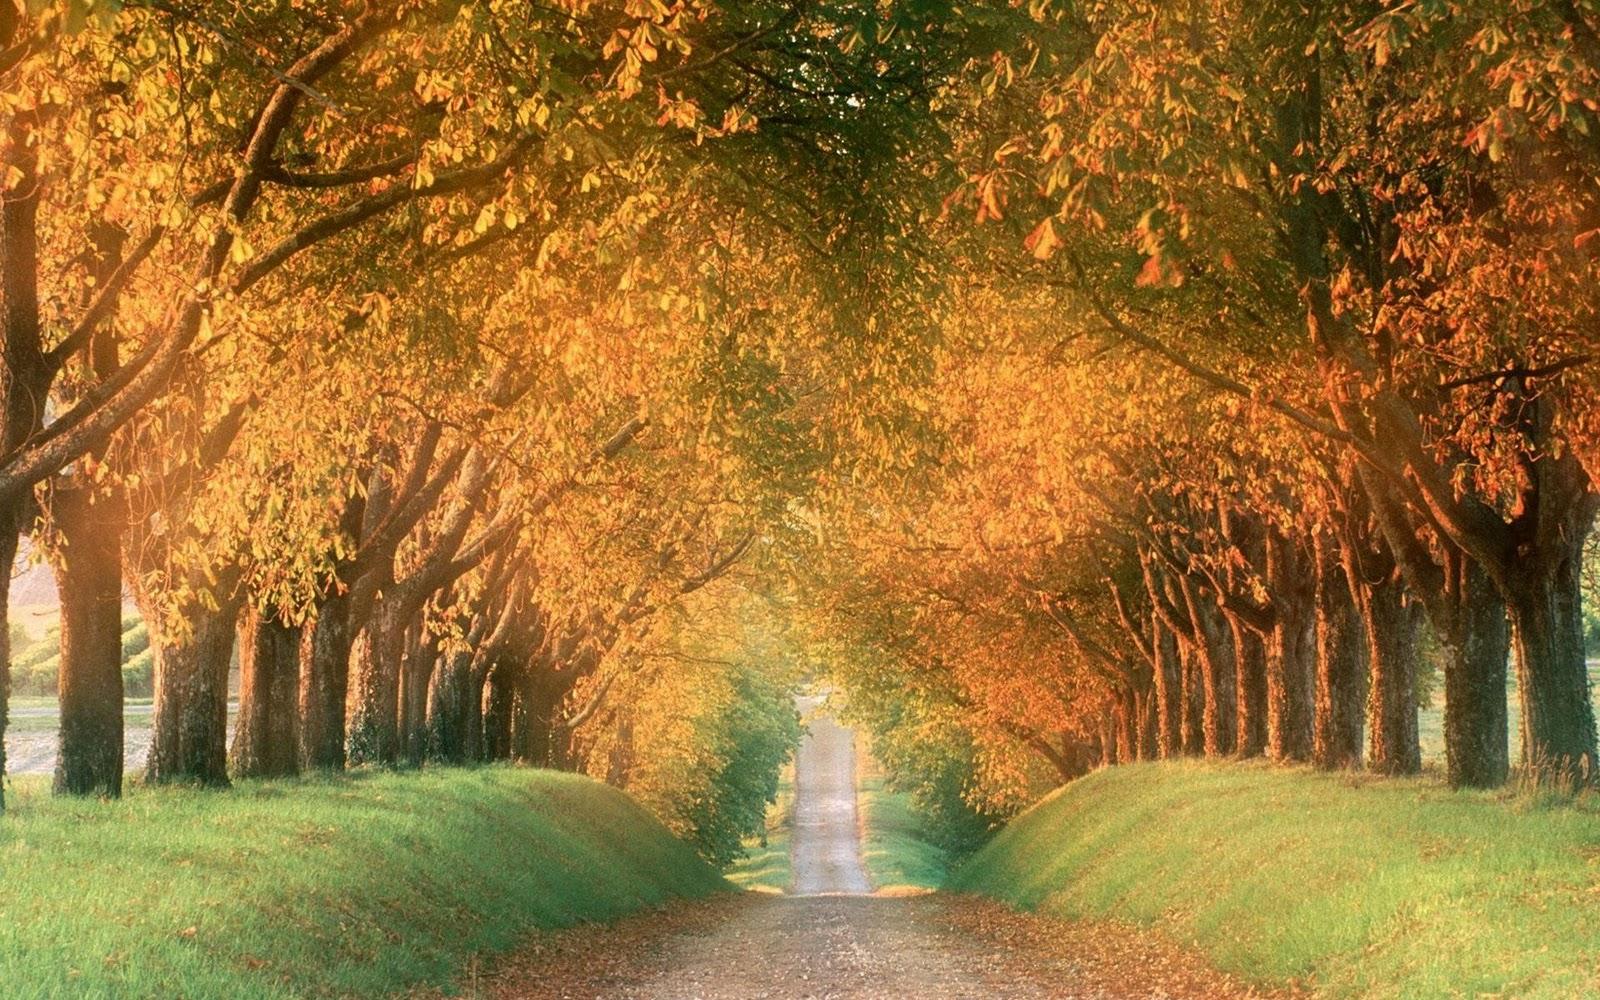 http://1.bp.blogspot.com/-HD8WlEcNYrk/Tu77fOQO1eI/AAAAAAAAB2Y/gfHMJaOxl2U/s1600/Best-Autumn-Photo-PC-Desktop-wallpapers-picture-HD-collection-17.jpeg